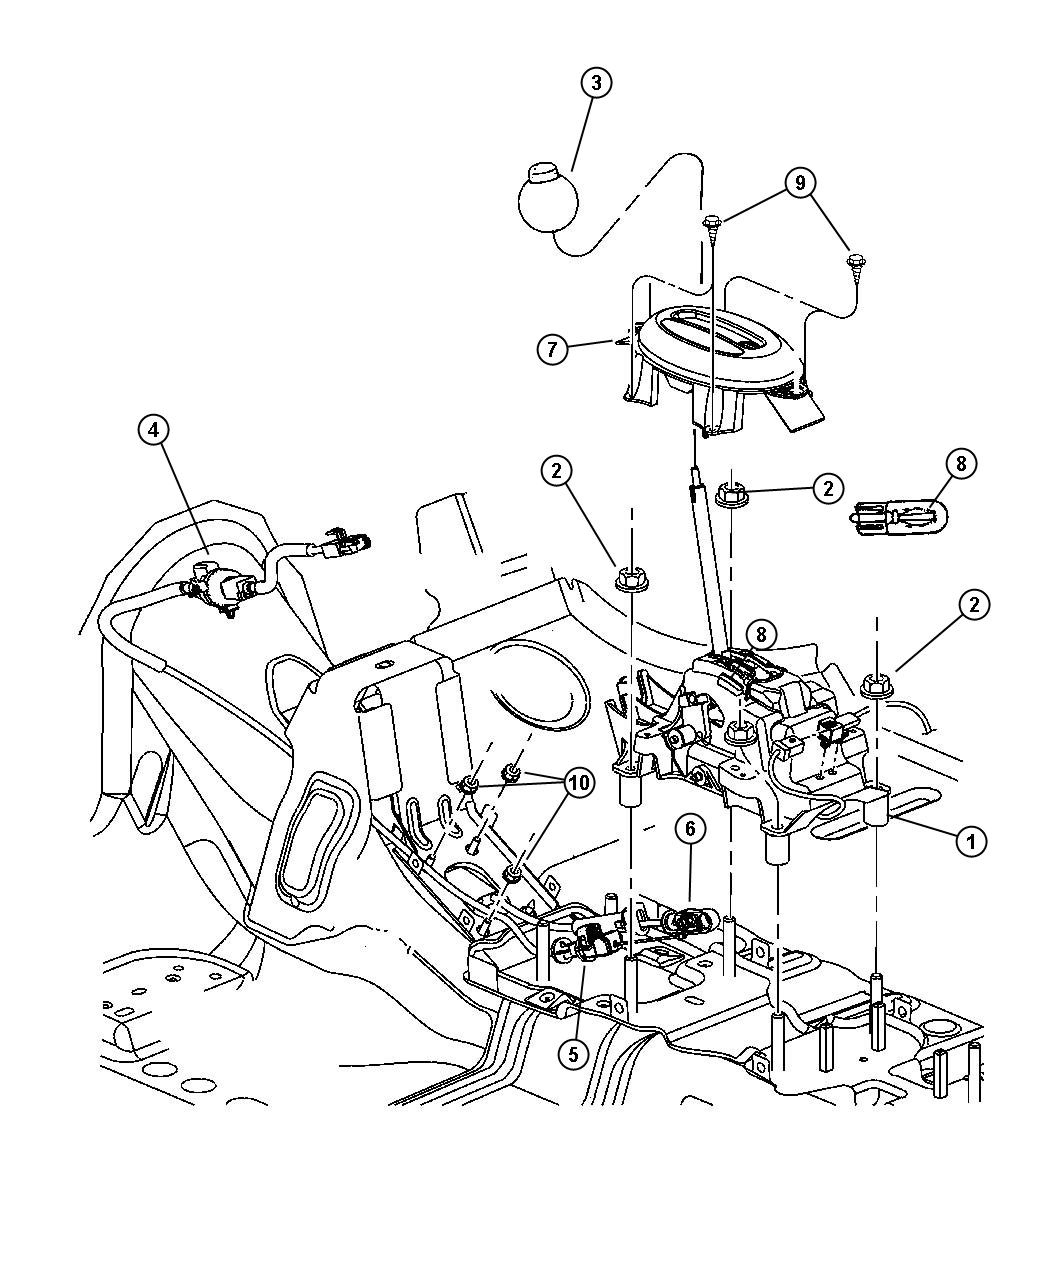 Chrysler Pt Cruiser Cable Ignition Interlock